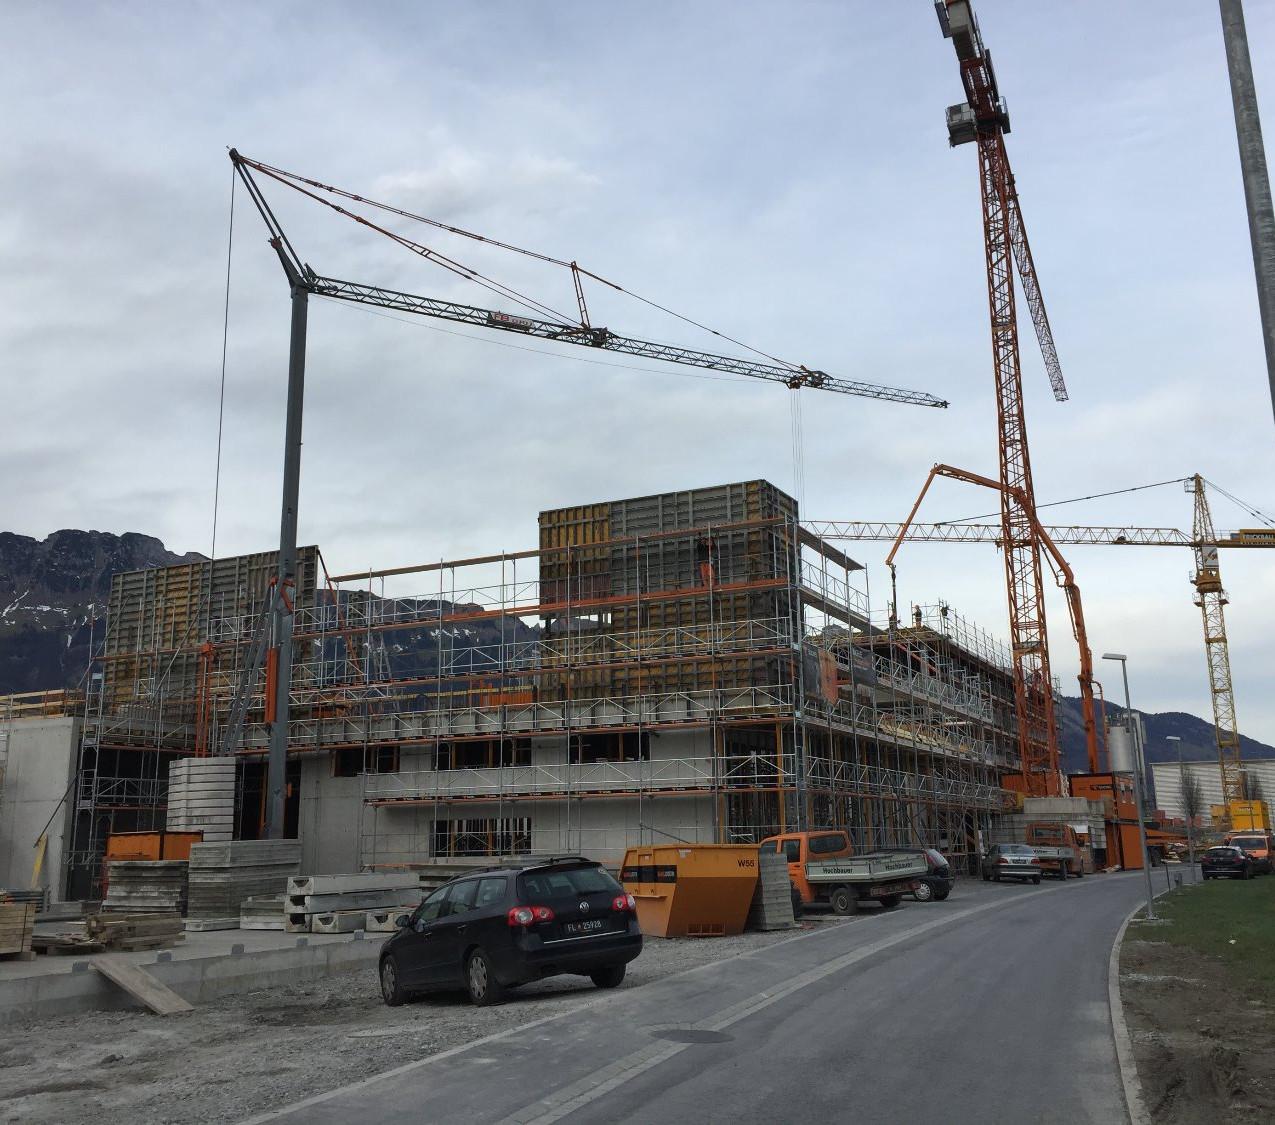 Bendern-Gamprin: Industriebauten